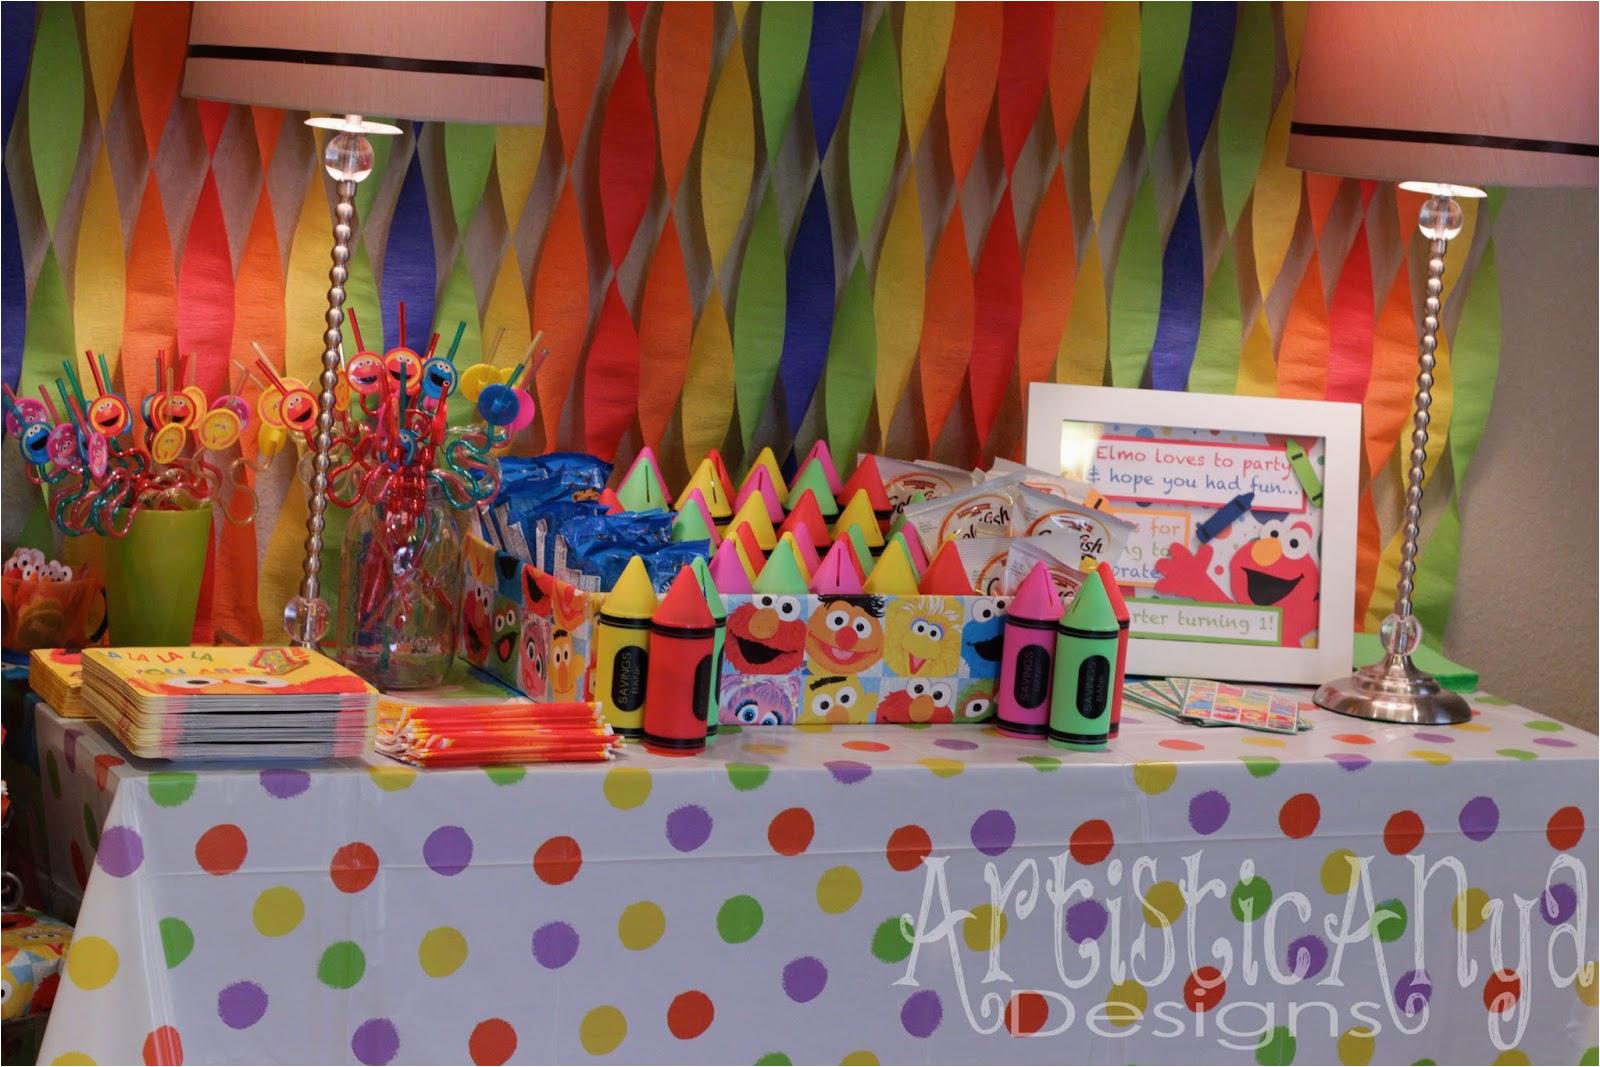 collectionedwn elmo 1st birthday decorations